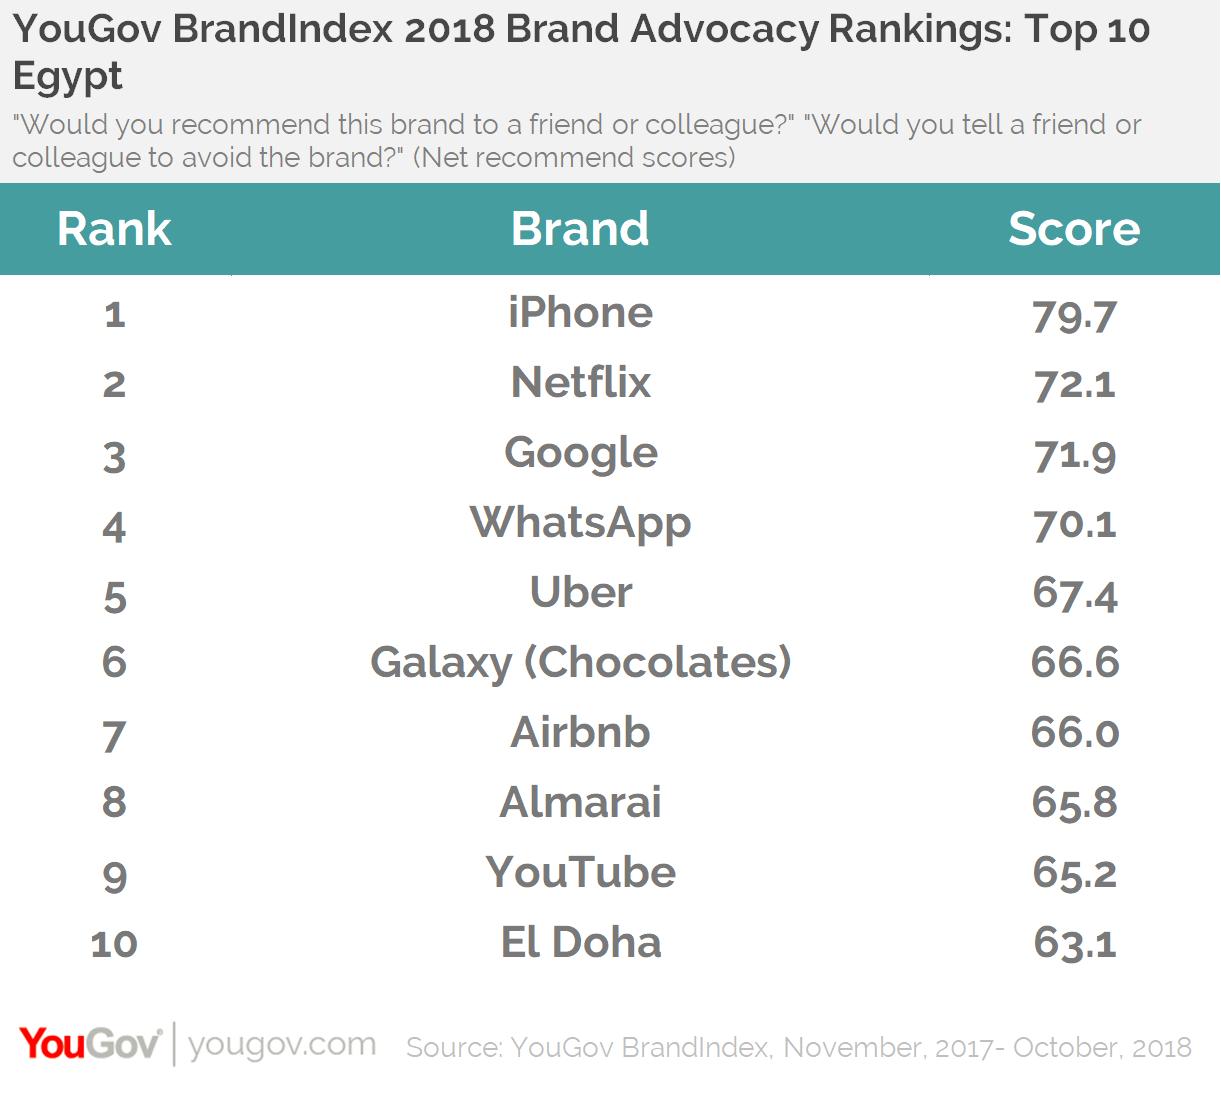 YouGov BrandIndex 2018 Brand Advocacy Rankings: Top 10 Egypt